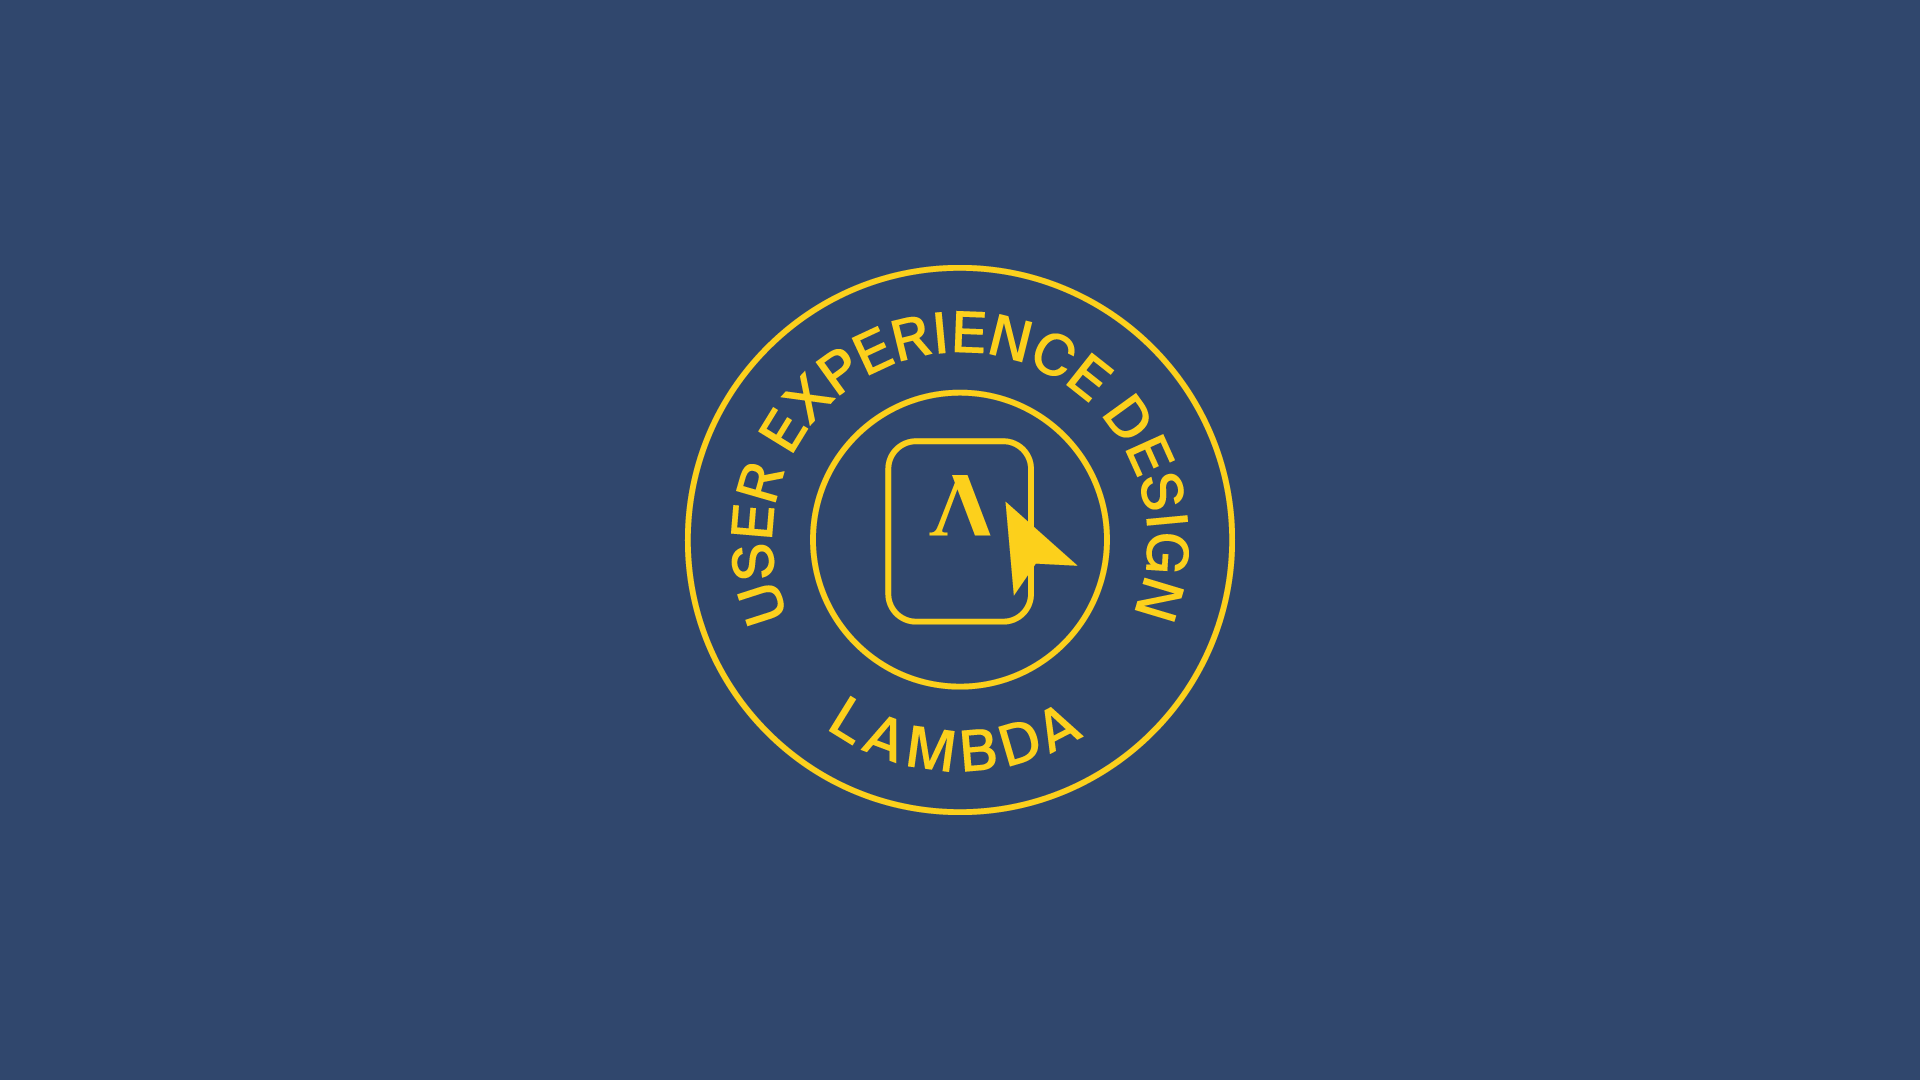 Lambda School UX shield on a blue background